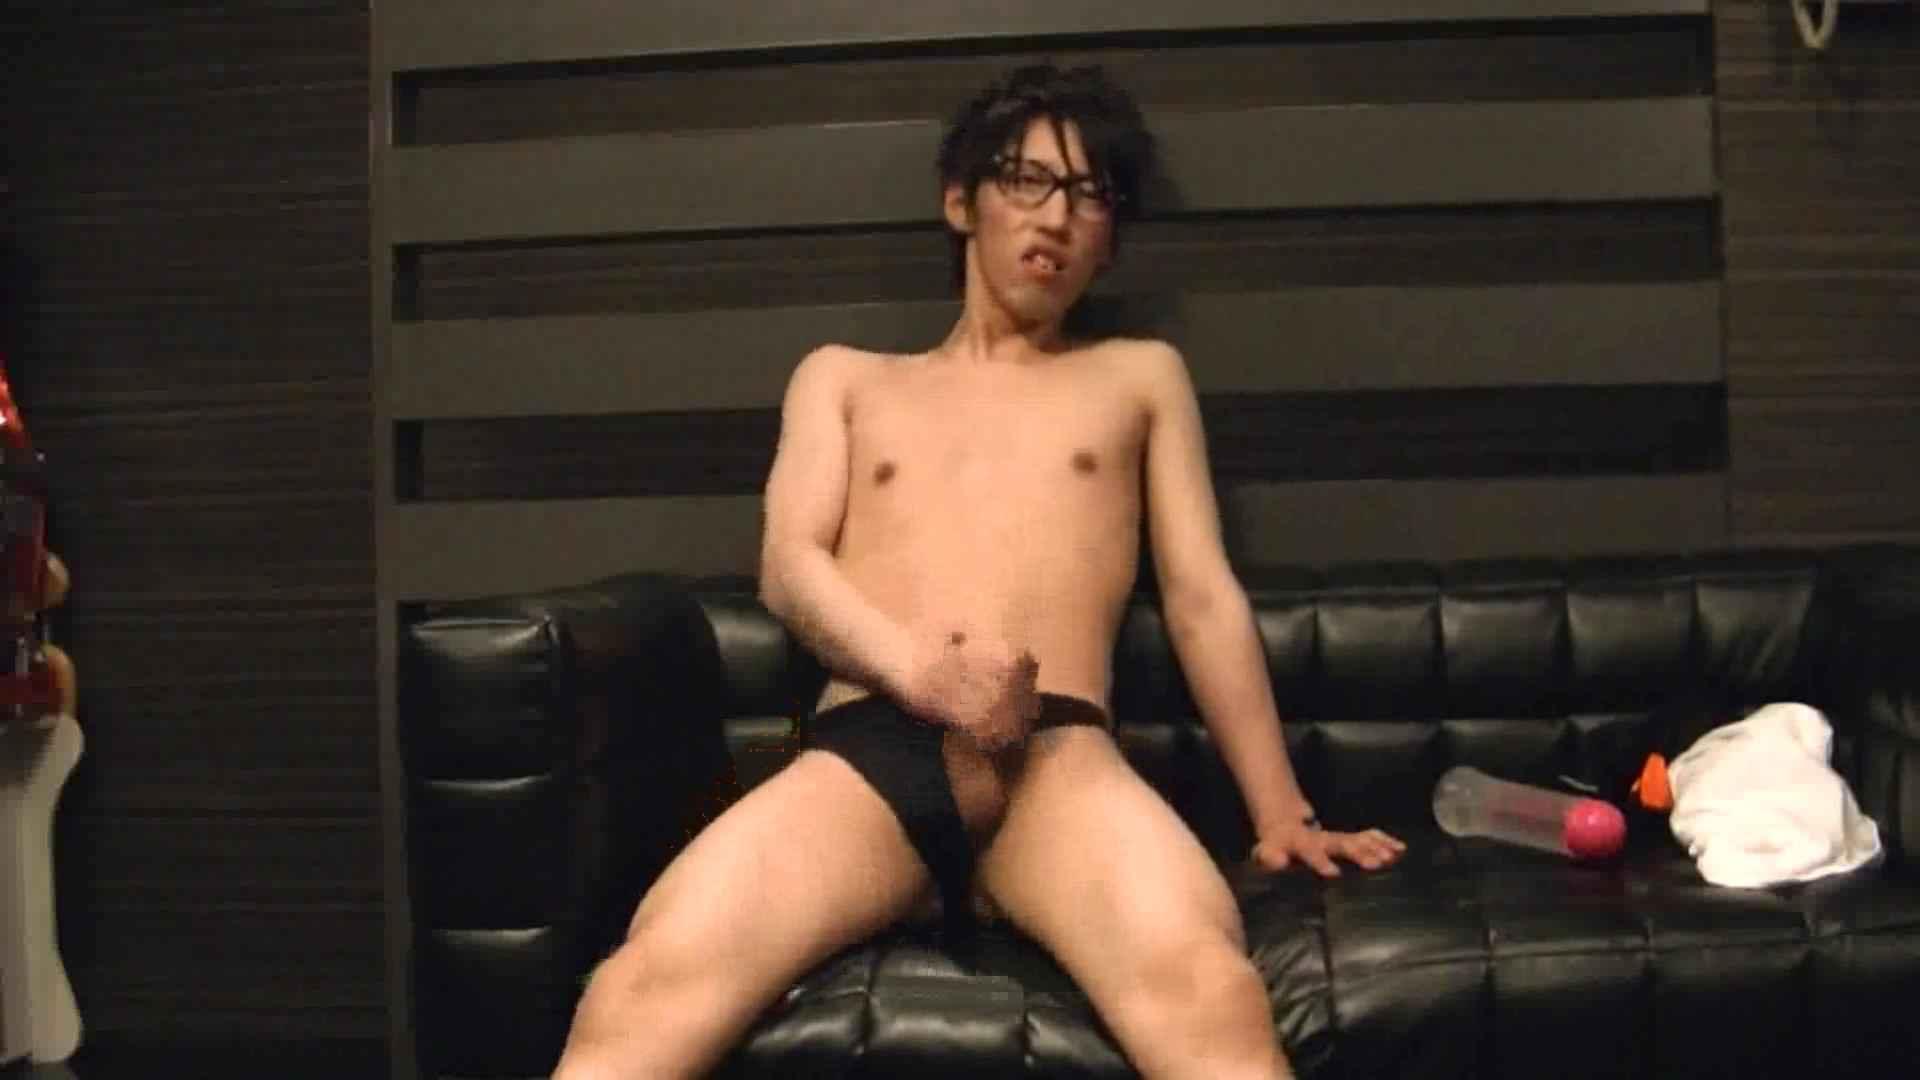 ONA見せカーニバル!! Vol3 男  93pic 7